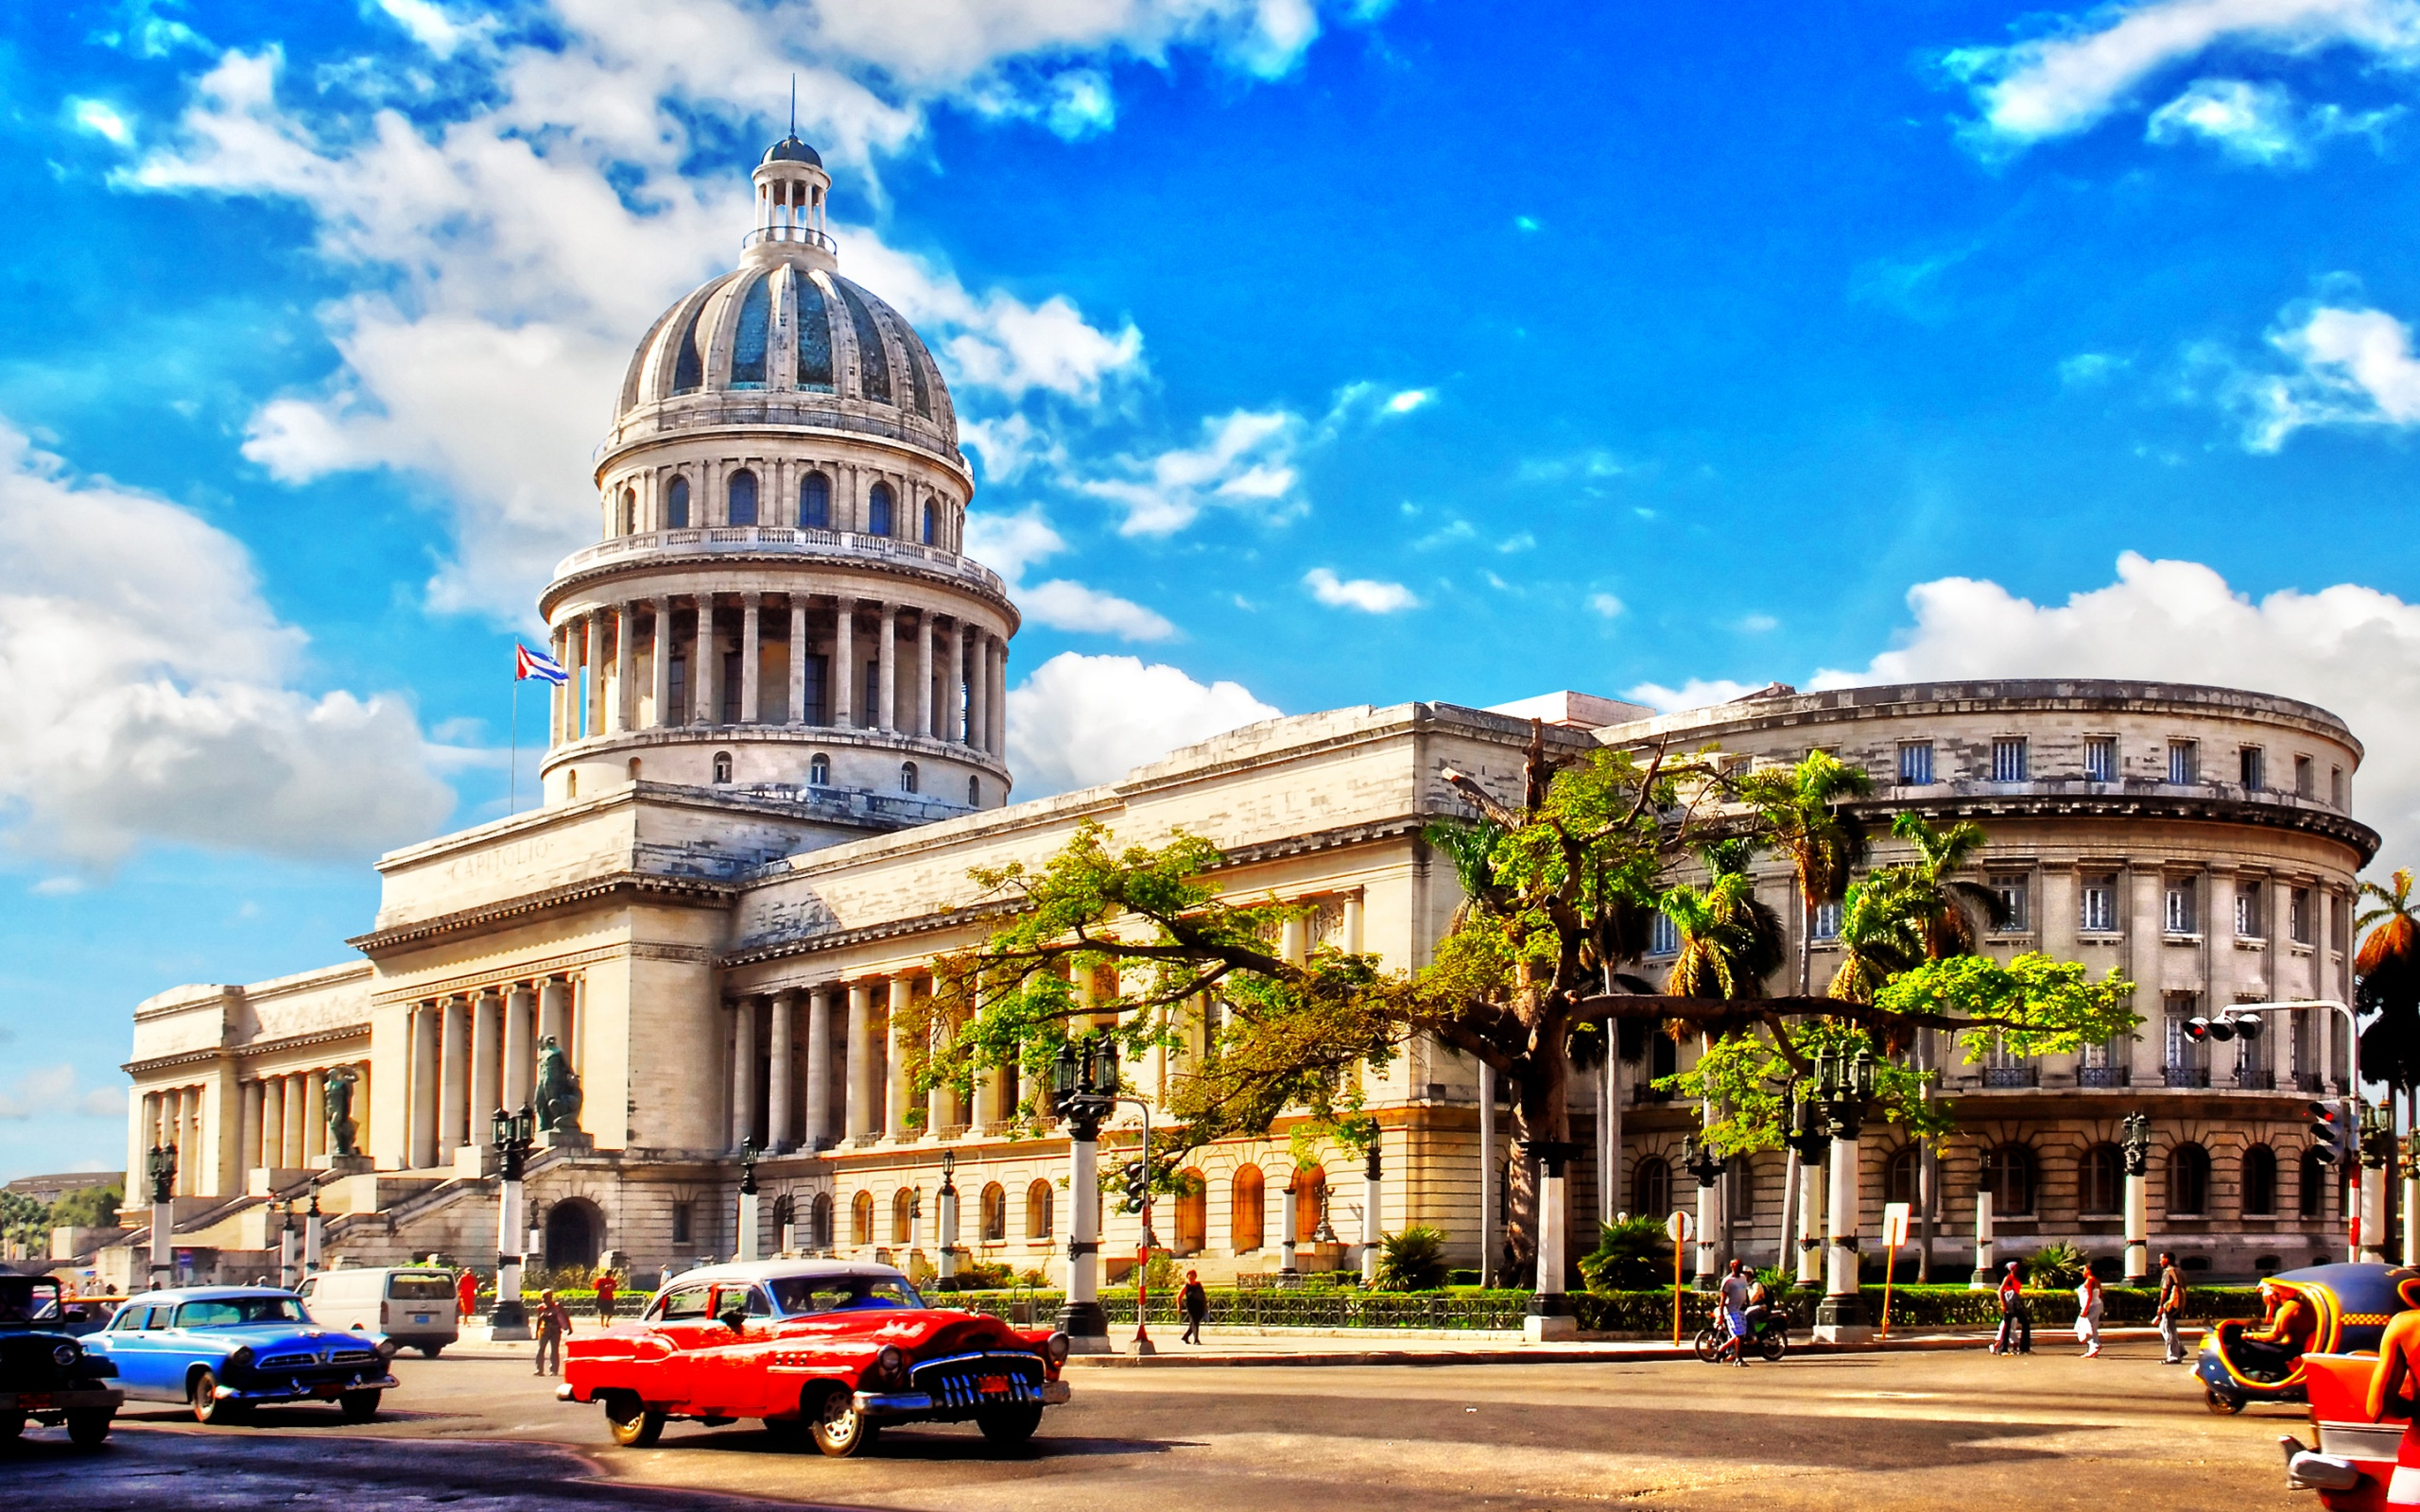 https://floridapolitics.com/wp-content/uploads/2014/11/cuba.jpg